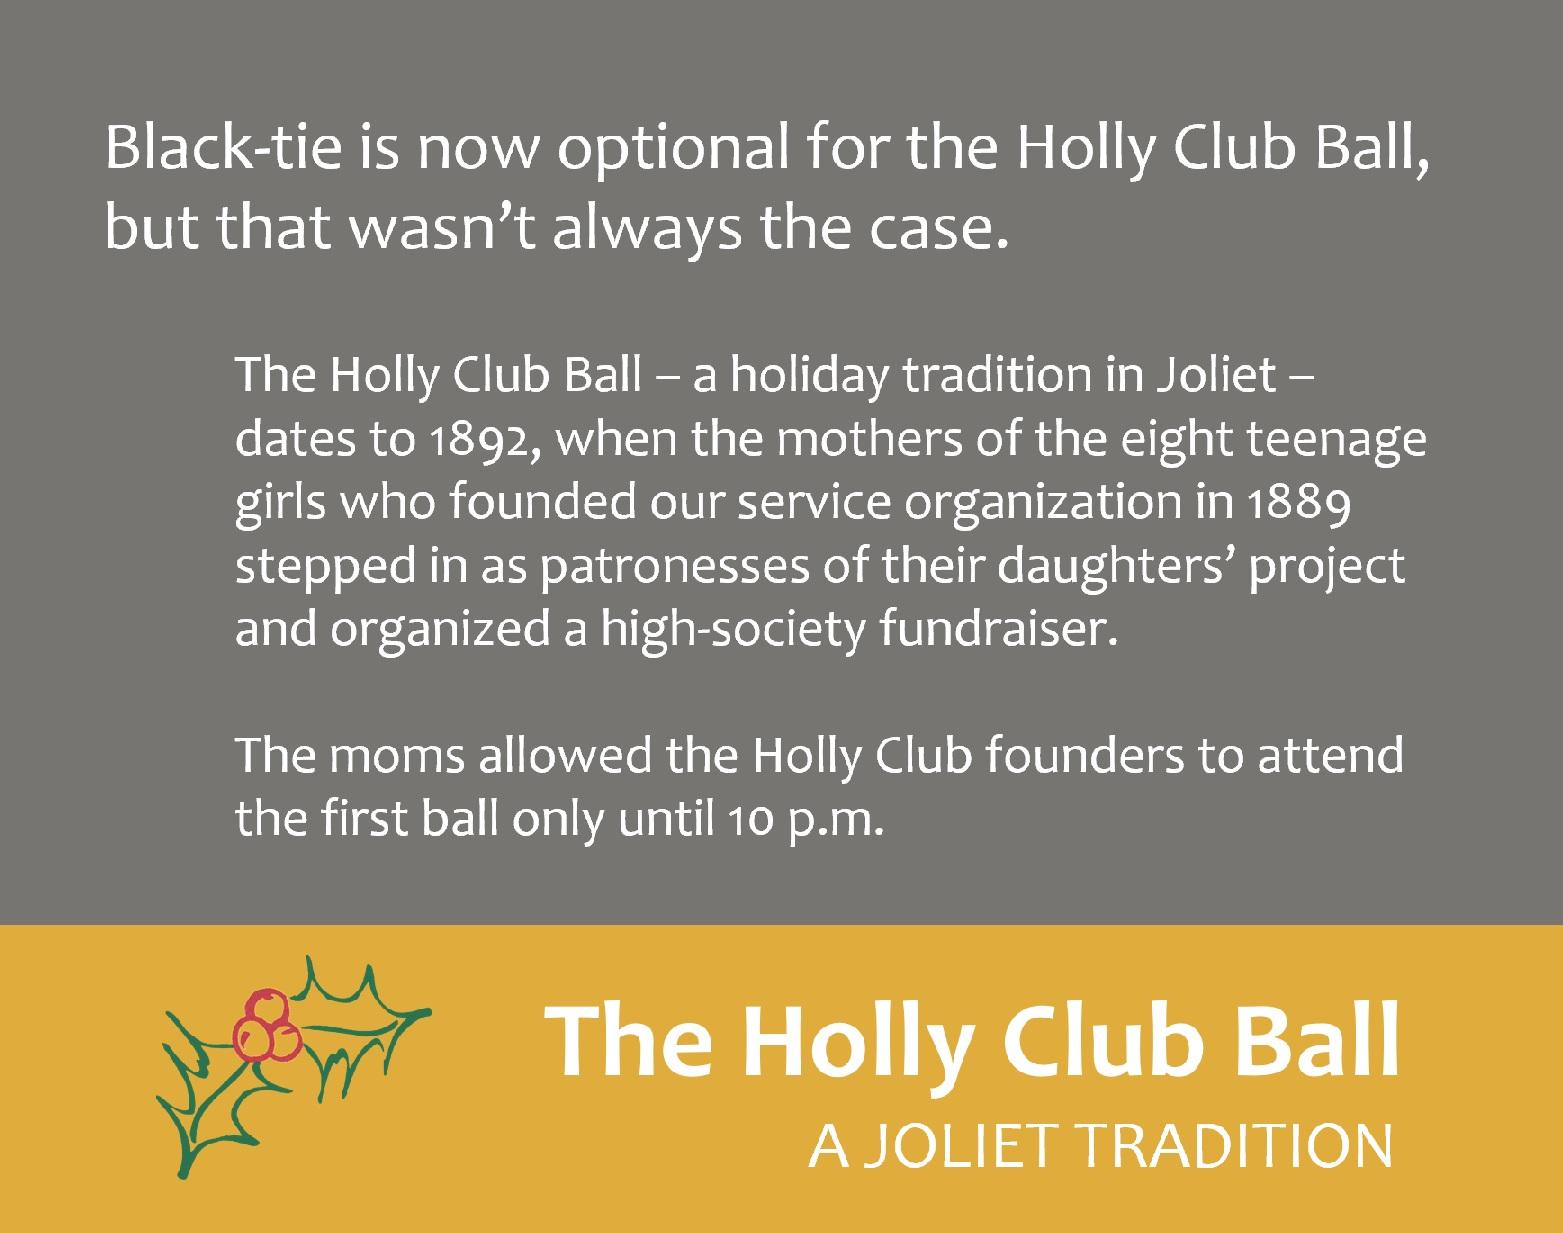 Holly Club Ball history